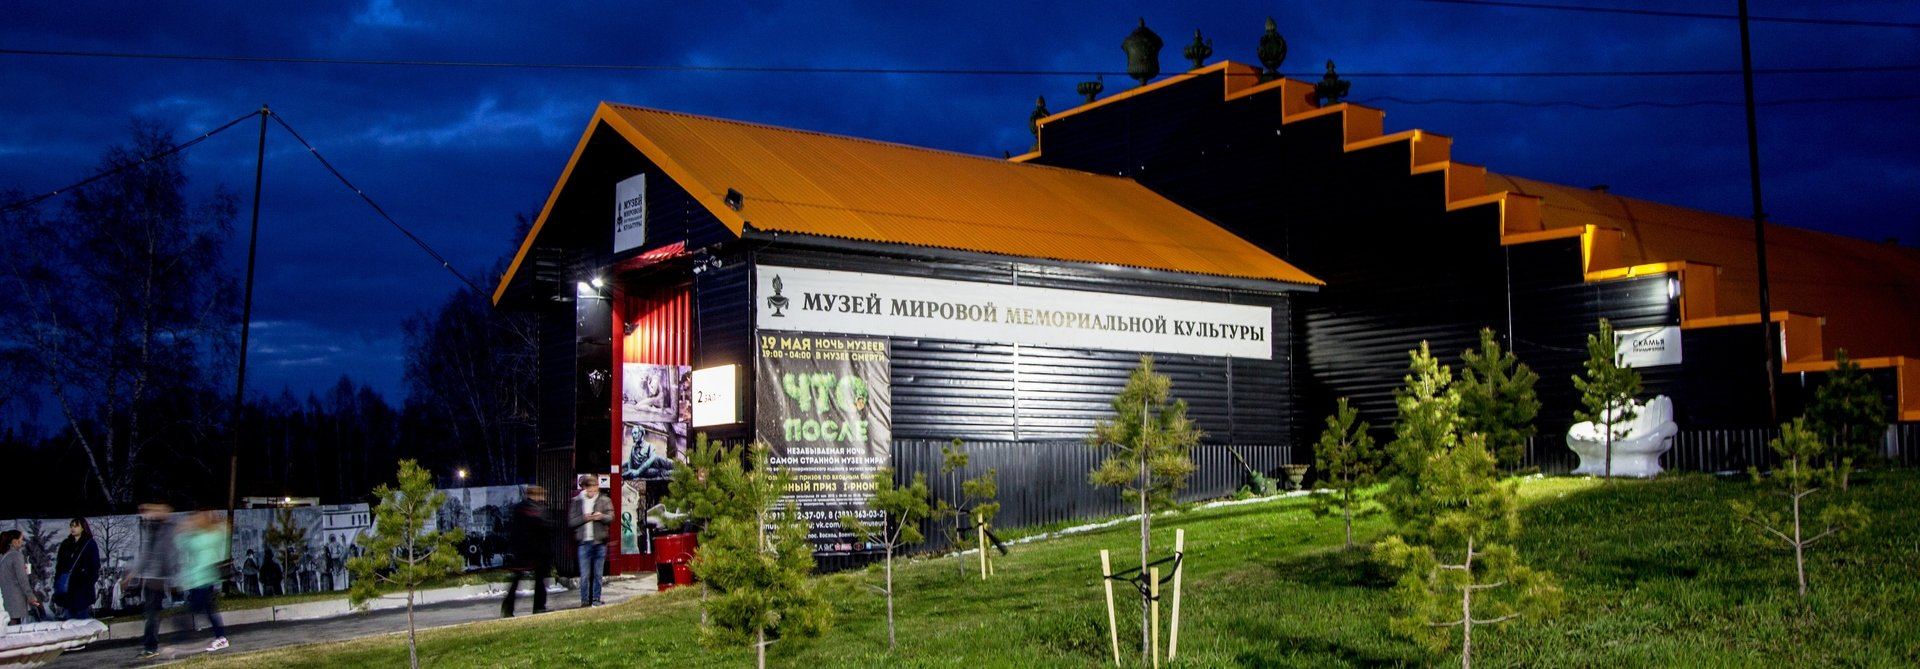 Музей погребальной культуры, зал 2